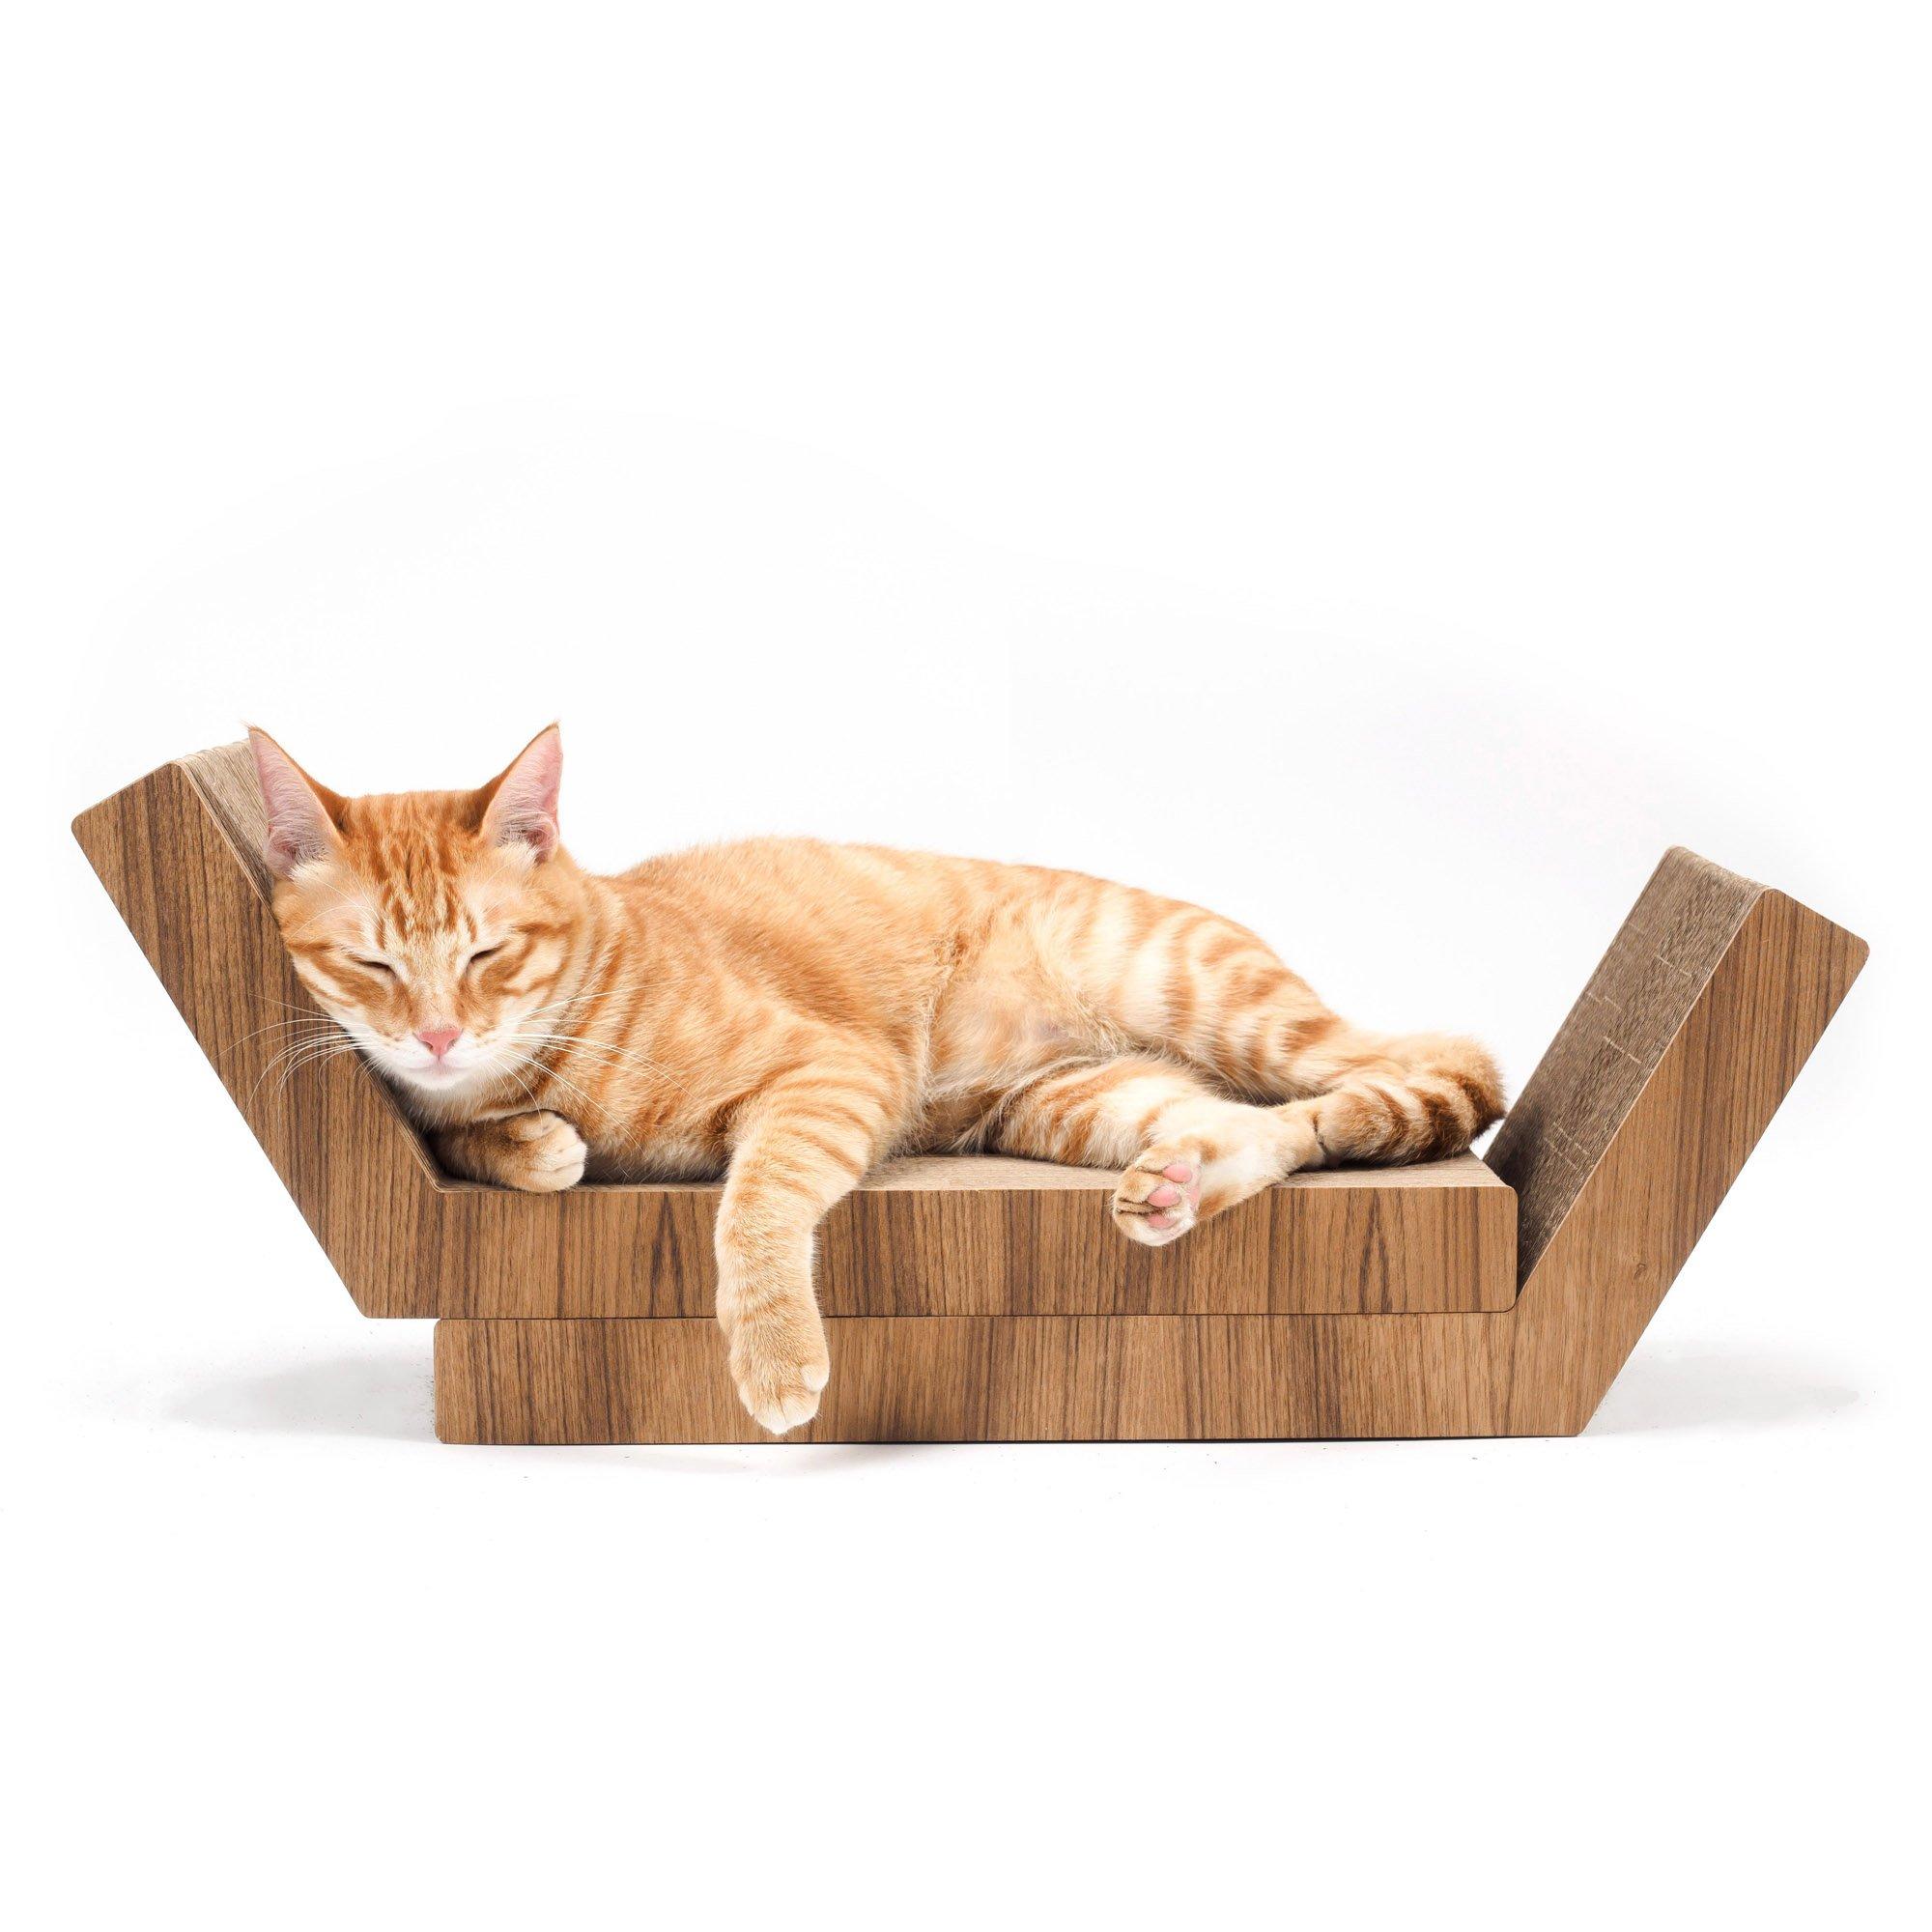 KATRIS Lynks Modular Cat Scratcher - 2 Pack, Real Teak Wood Cover by KATRIS